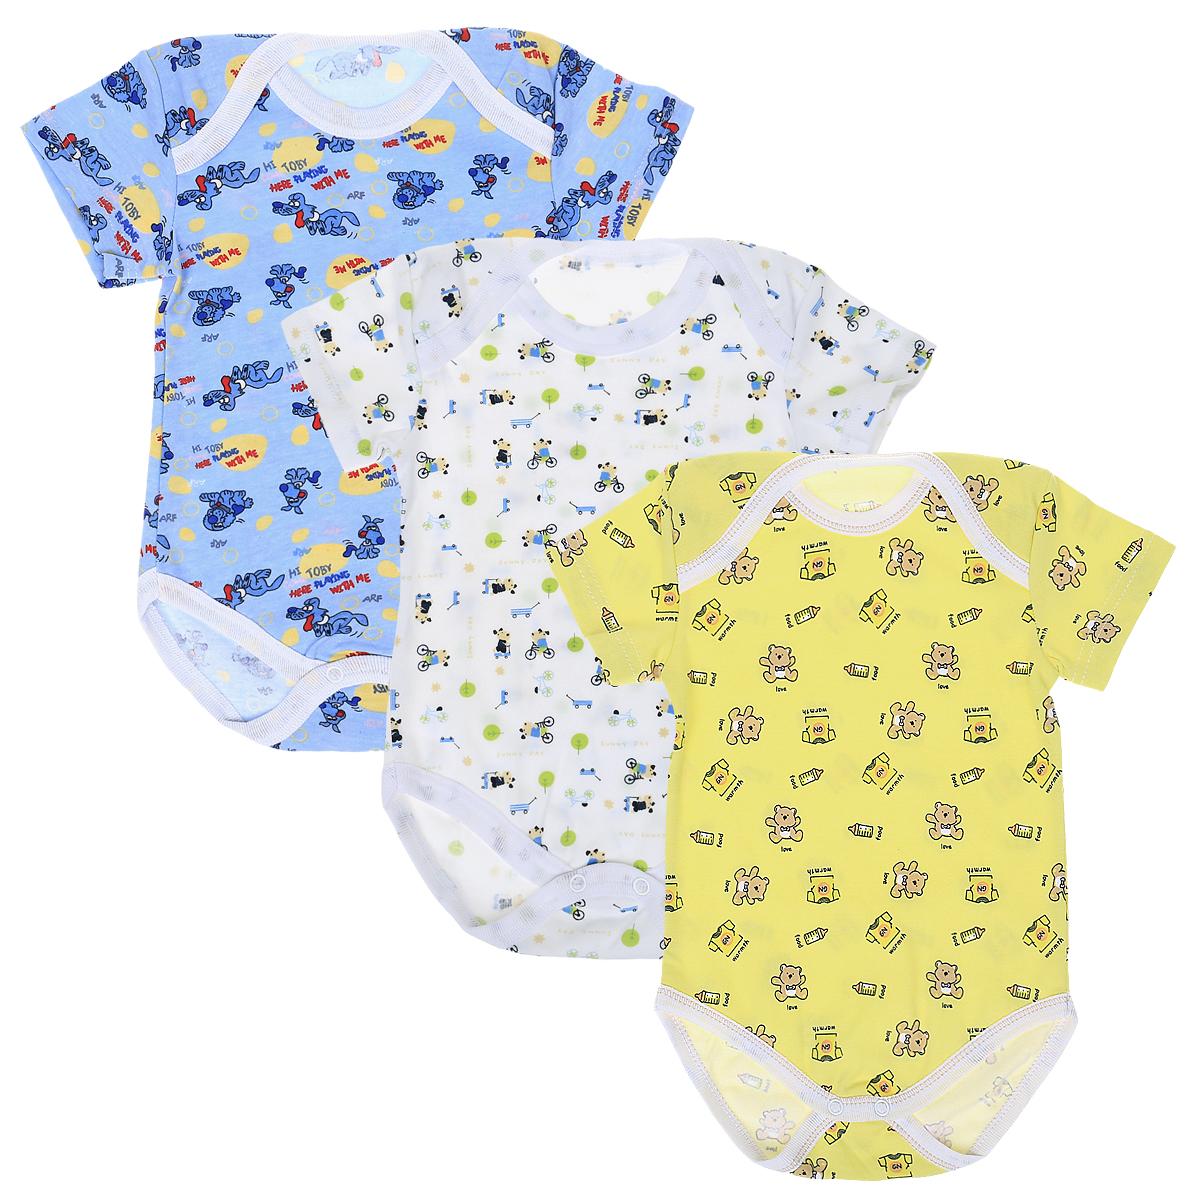 Боди для мальчика Фреш Стайл, цвет: белый, голубой, желтый, 3 шт. 33-315м. Размер 80 боди для мальчика spasilk цвет белый голубой зеленый 4 шт on s4hs2 размер xxl 18 месяцев